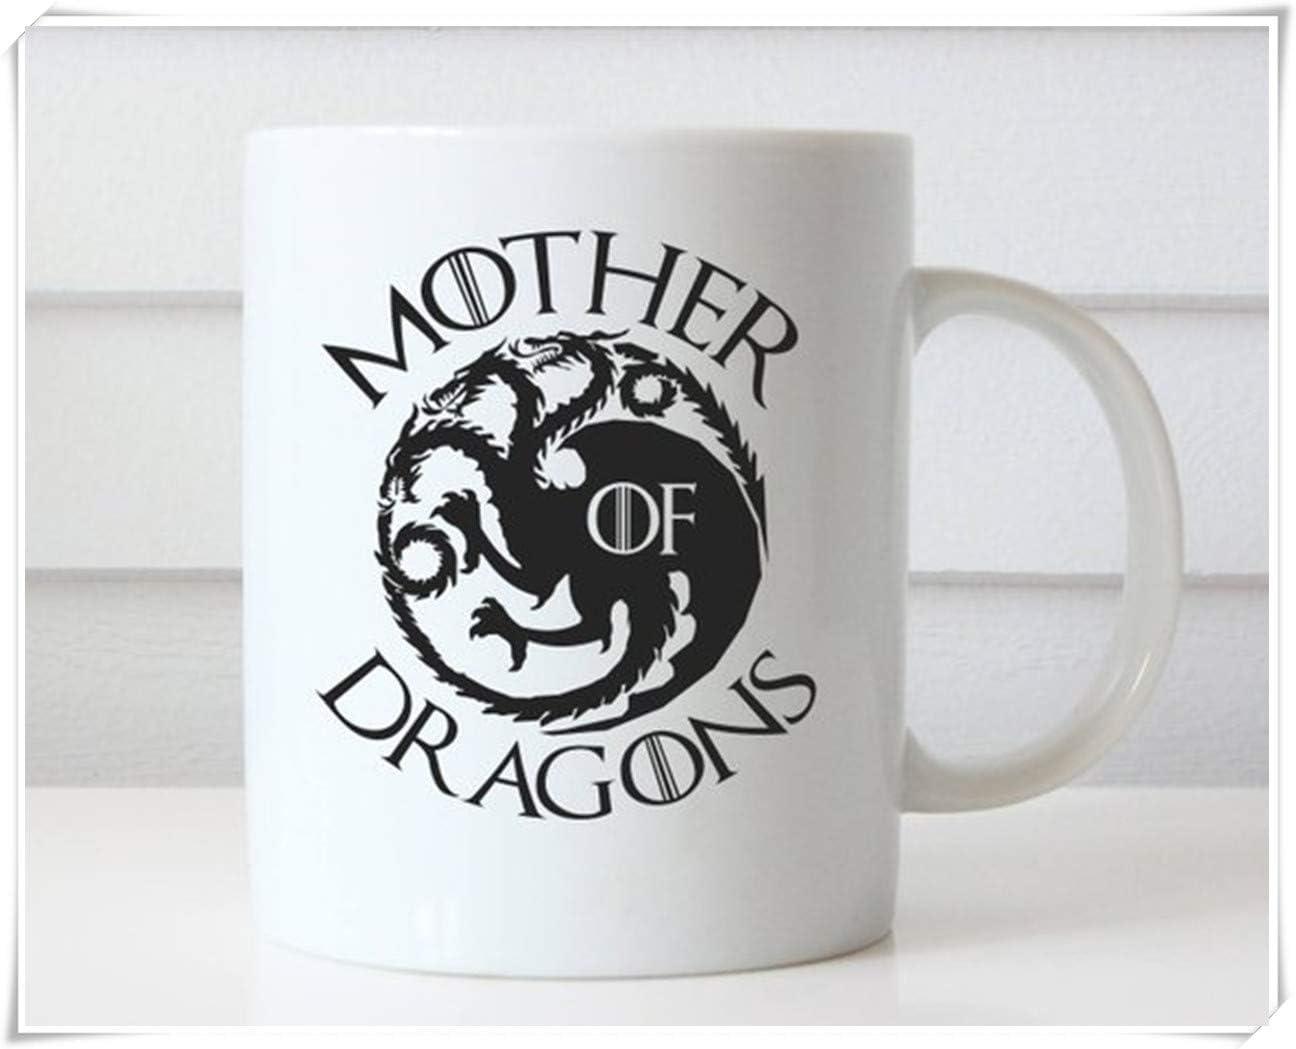 Amazon Com Ottoriven101 Mother Of Dragons Coffee Mug Mother Of Dragons Mug Game Of Thrones Coffee Mug Game Of Thrones Mug Game Of Thrones Gift Christmas Gift 11oz Ceramic Coffee Mug Tea Cup